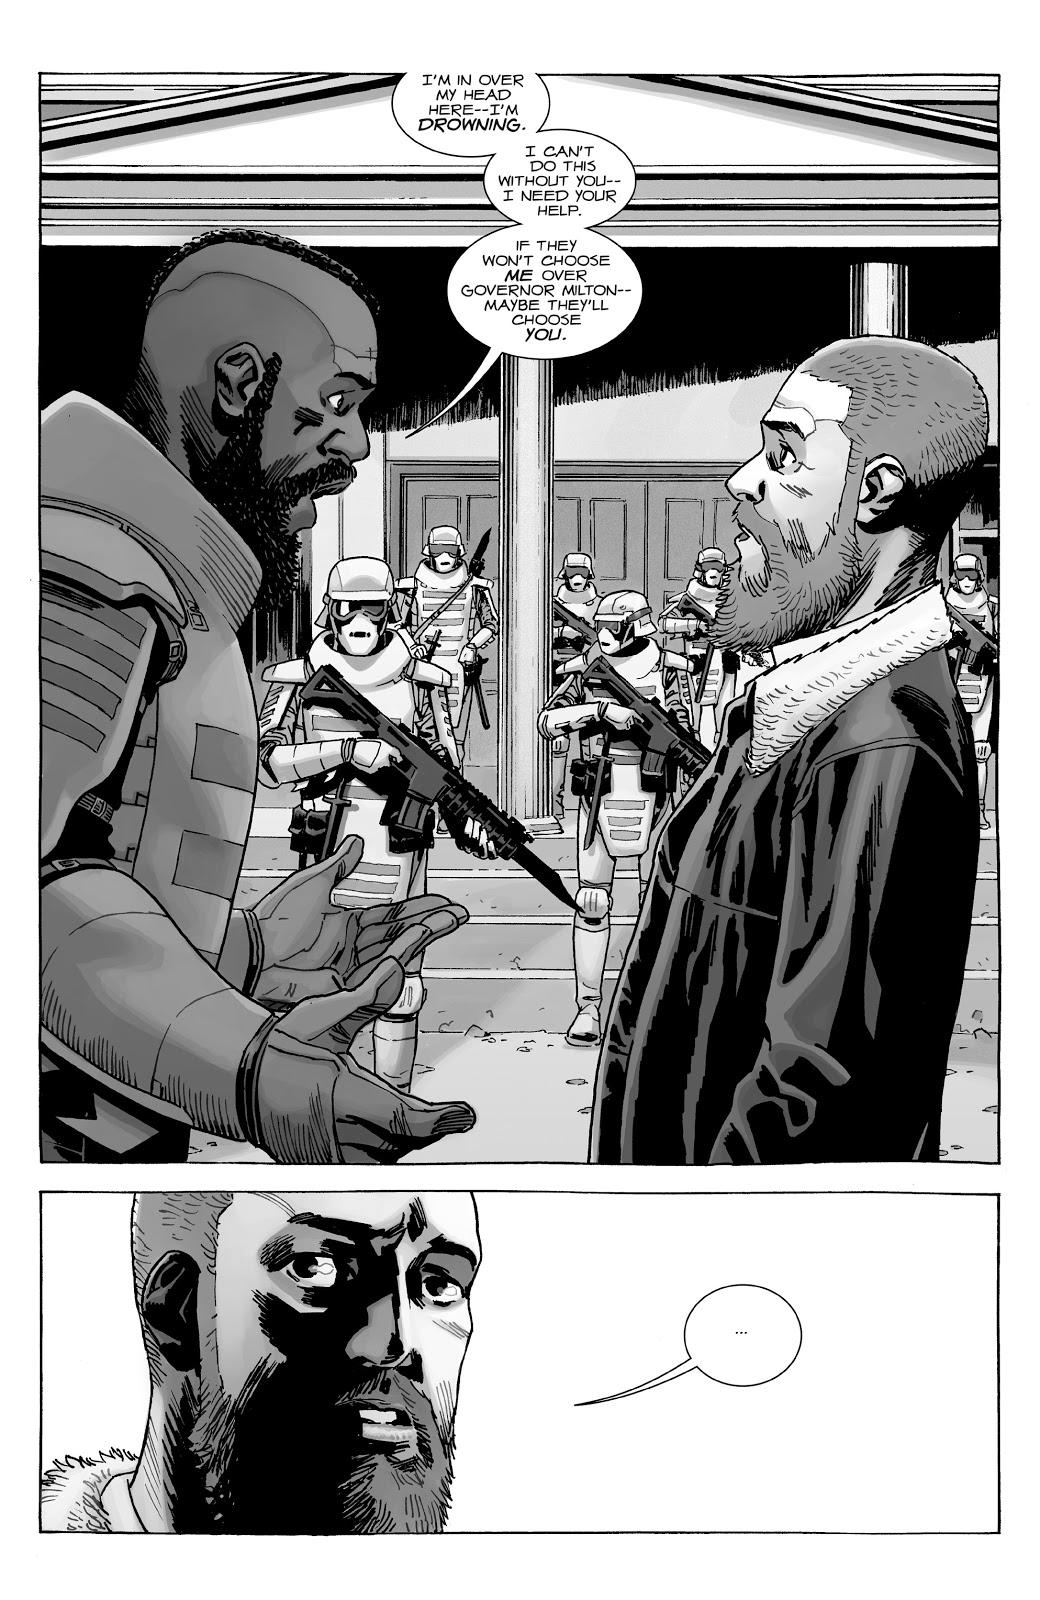 Mercer contando o plano dele para o Rick